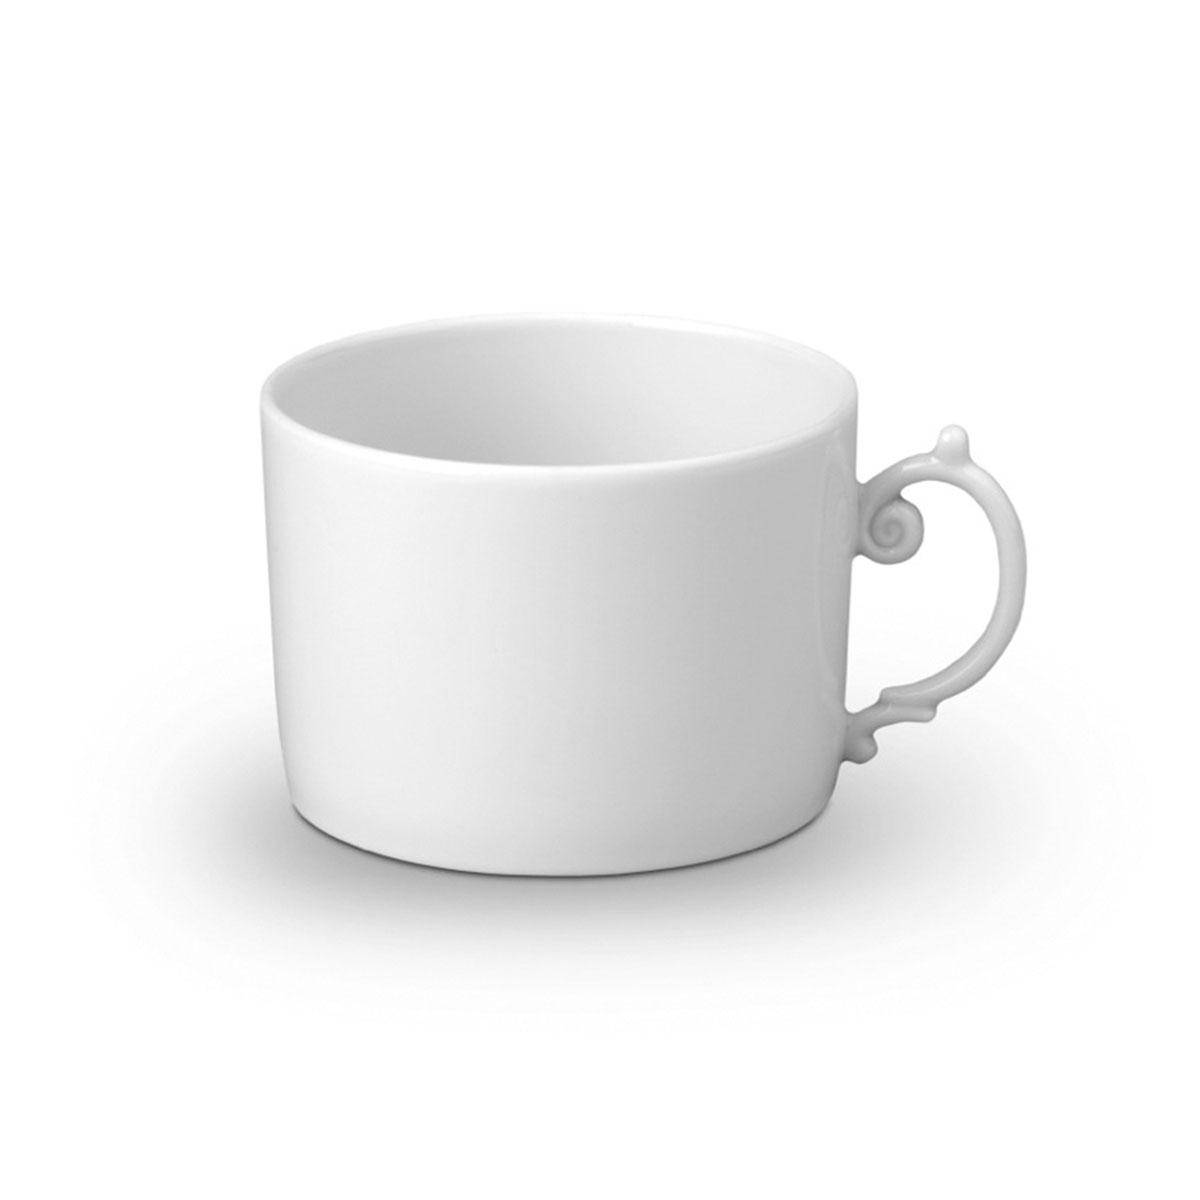 L'Objet I Aegean Tea Cup White